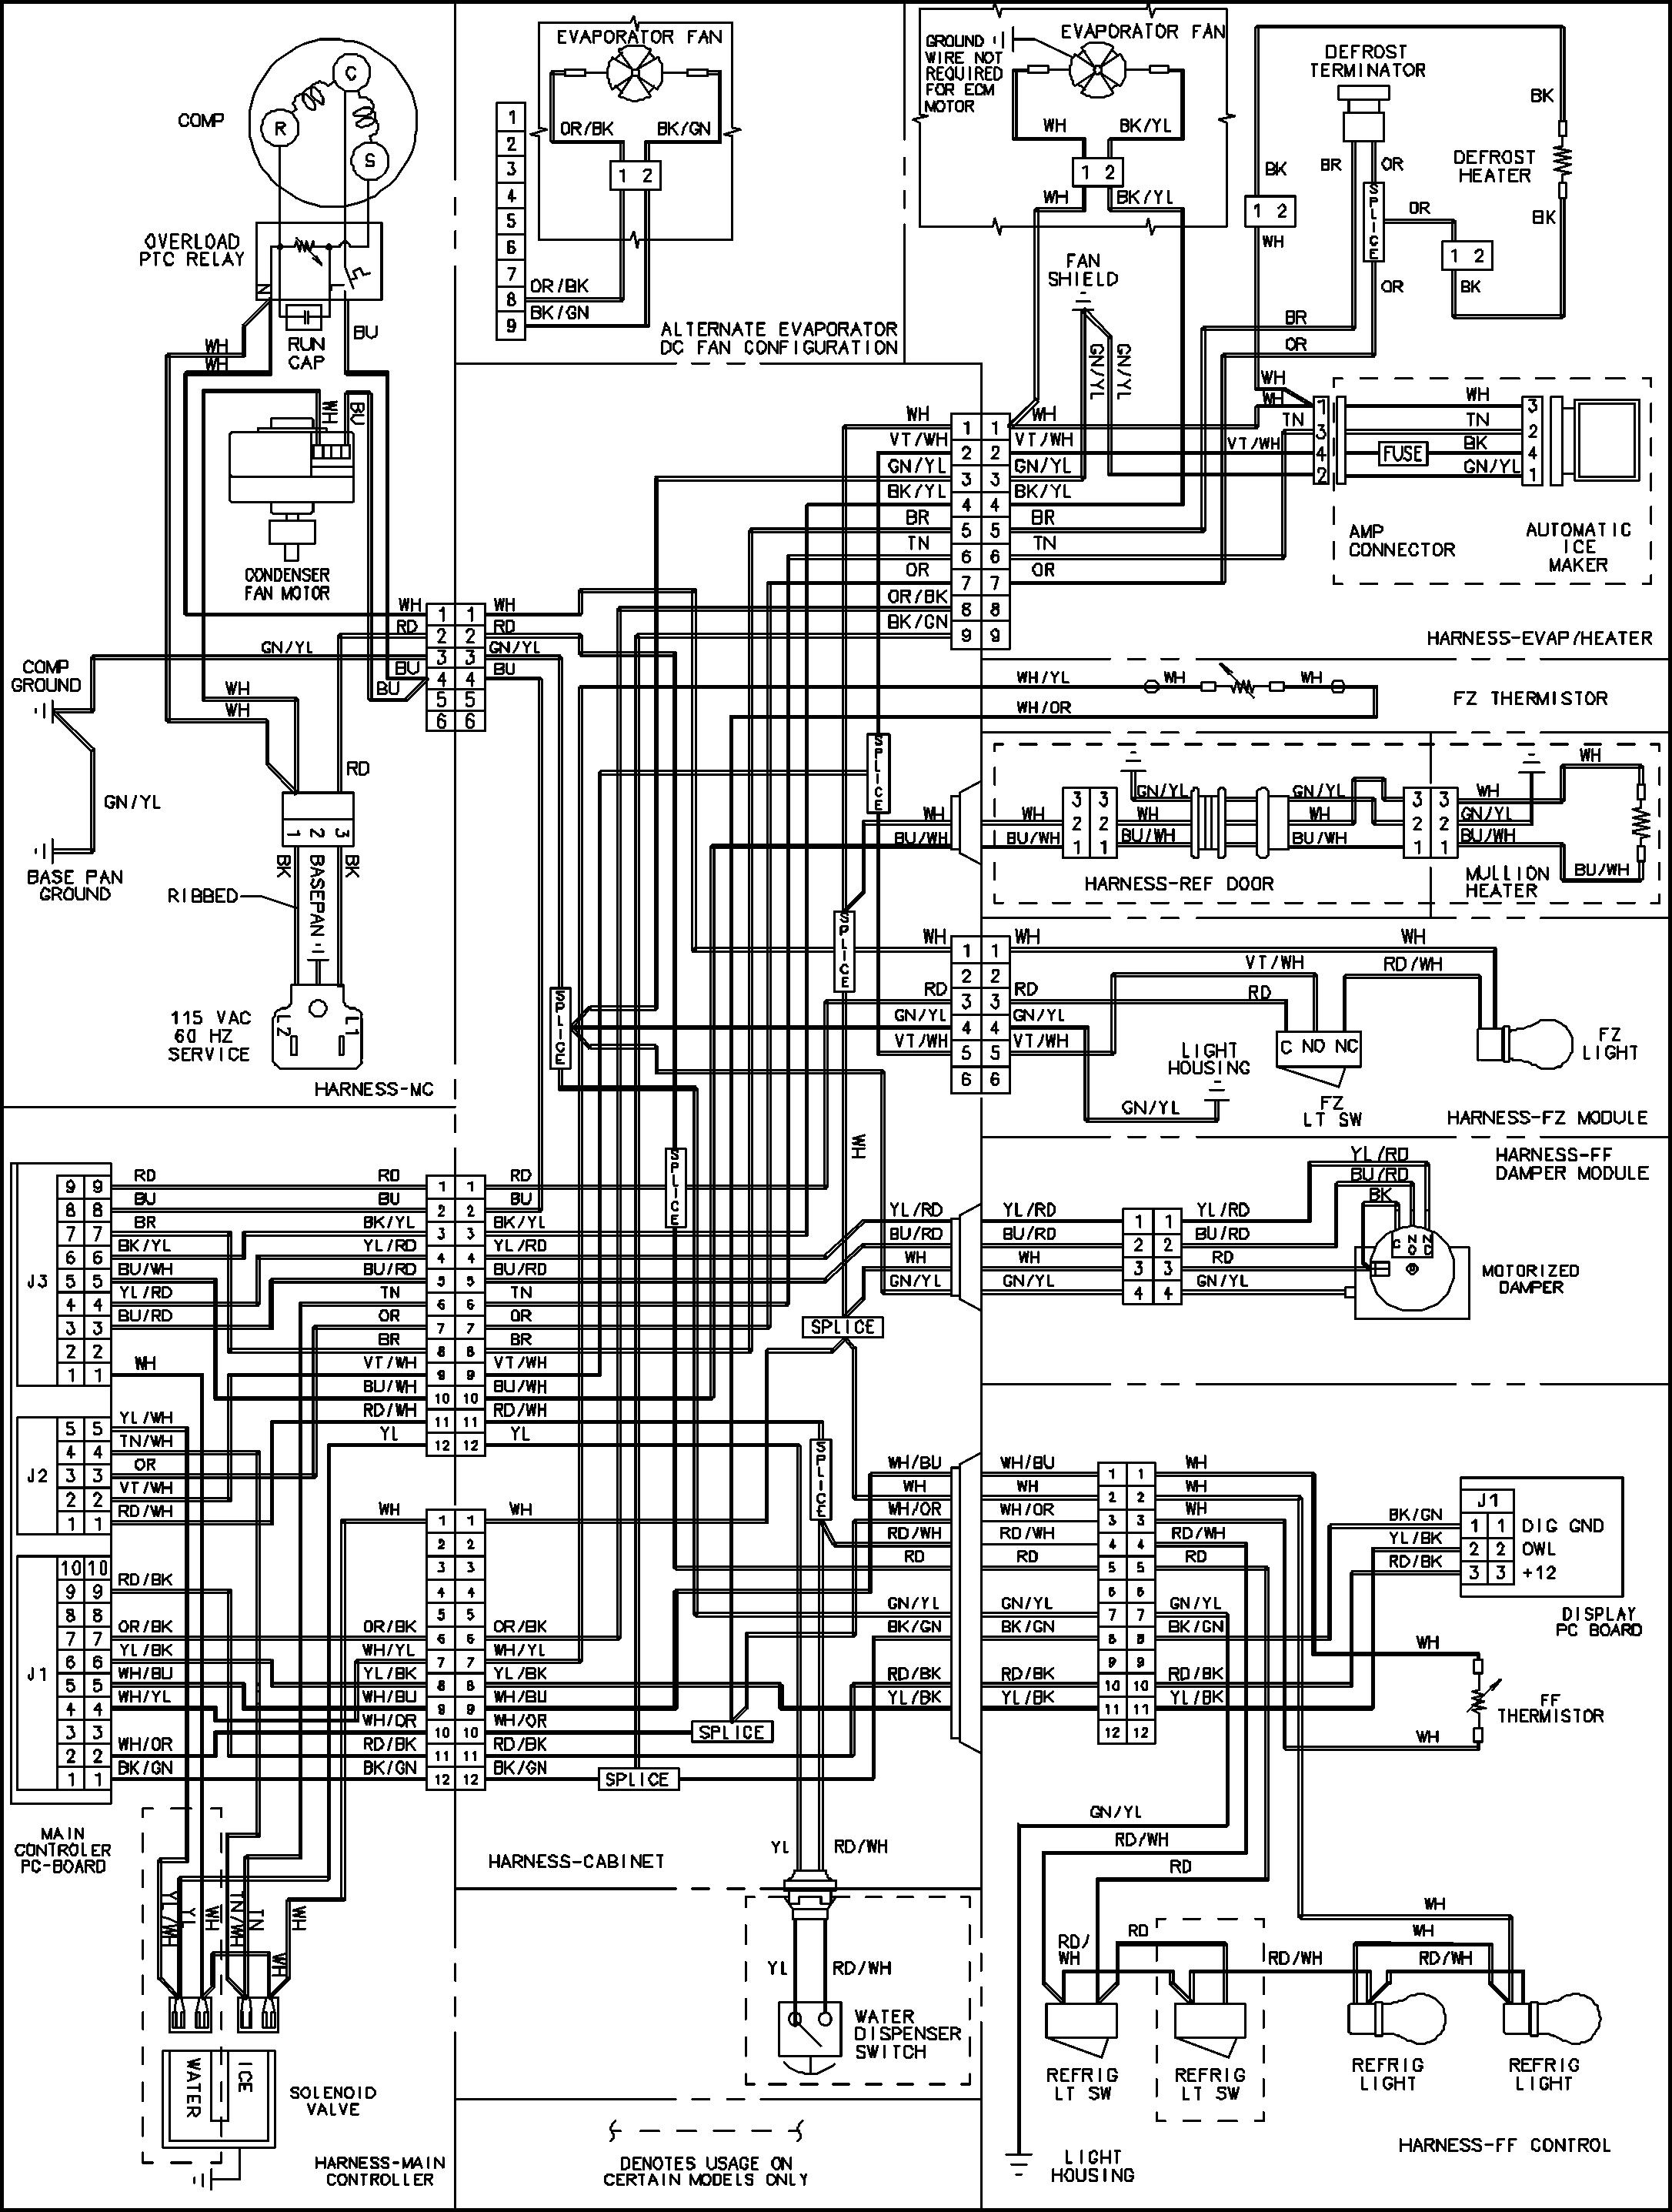 Walking Freezer Wire Diagram | Wiring Diagram - Walk In Freezer Wiring Diagram